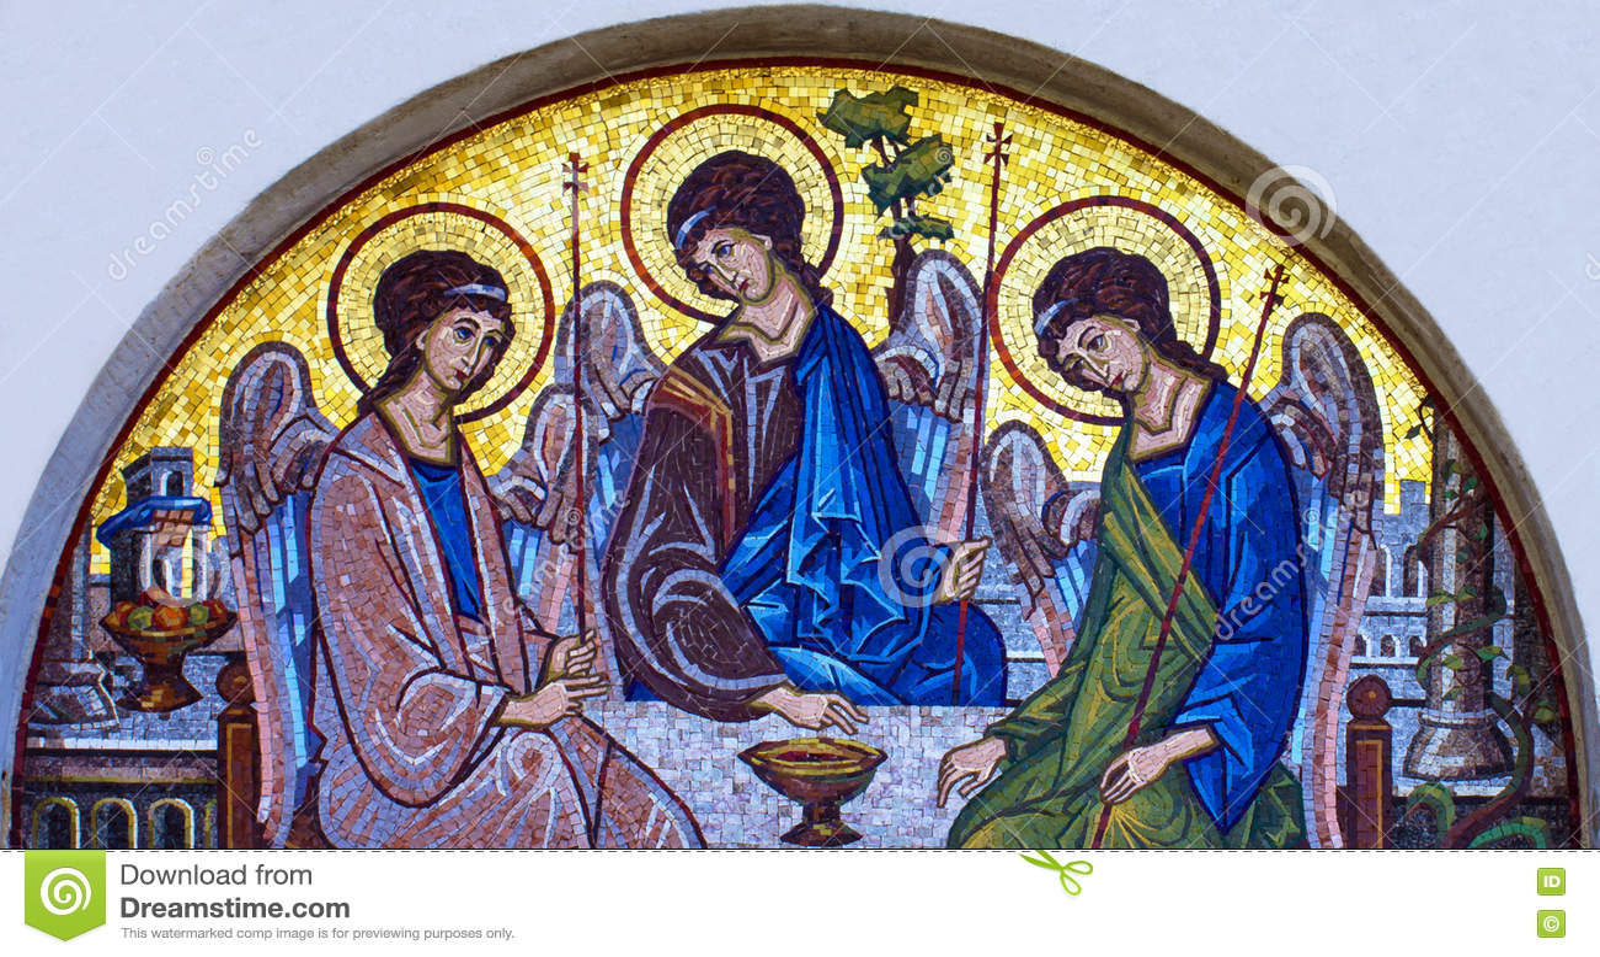 Mosaic icon of Holy Trinity in Orthodox Church, Budva, Montenegro